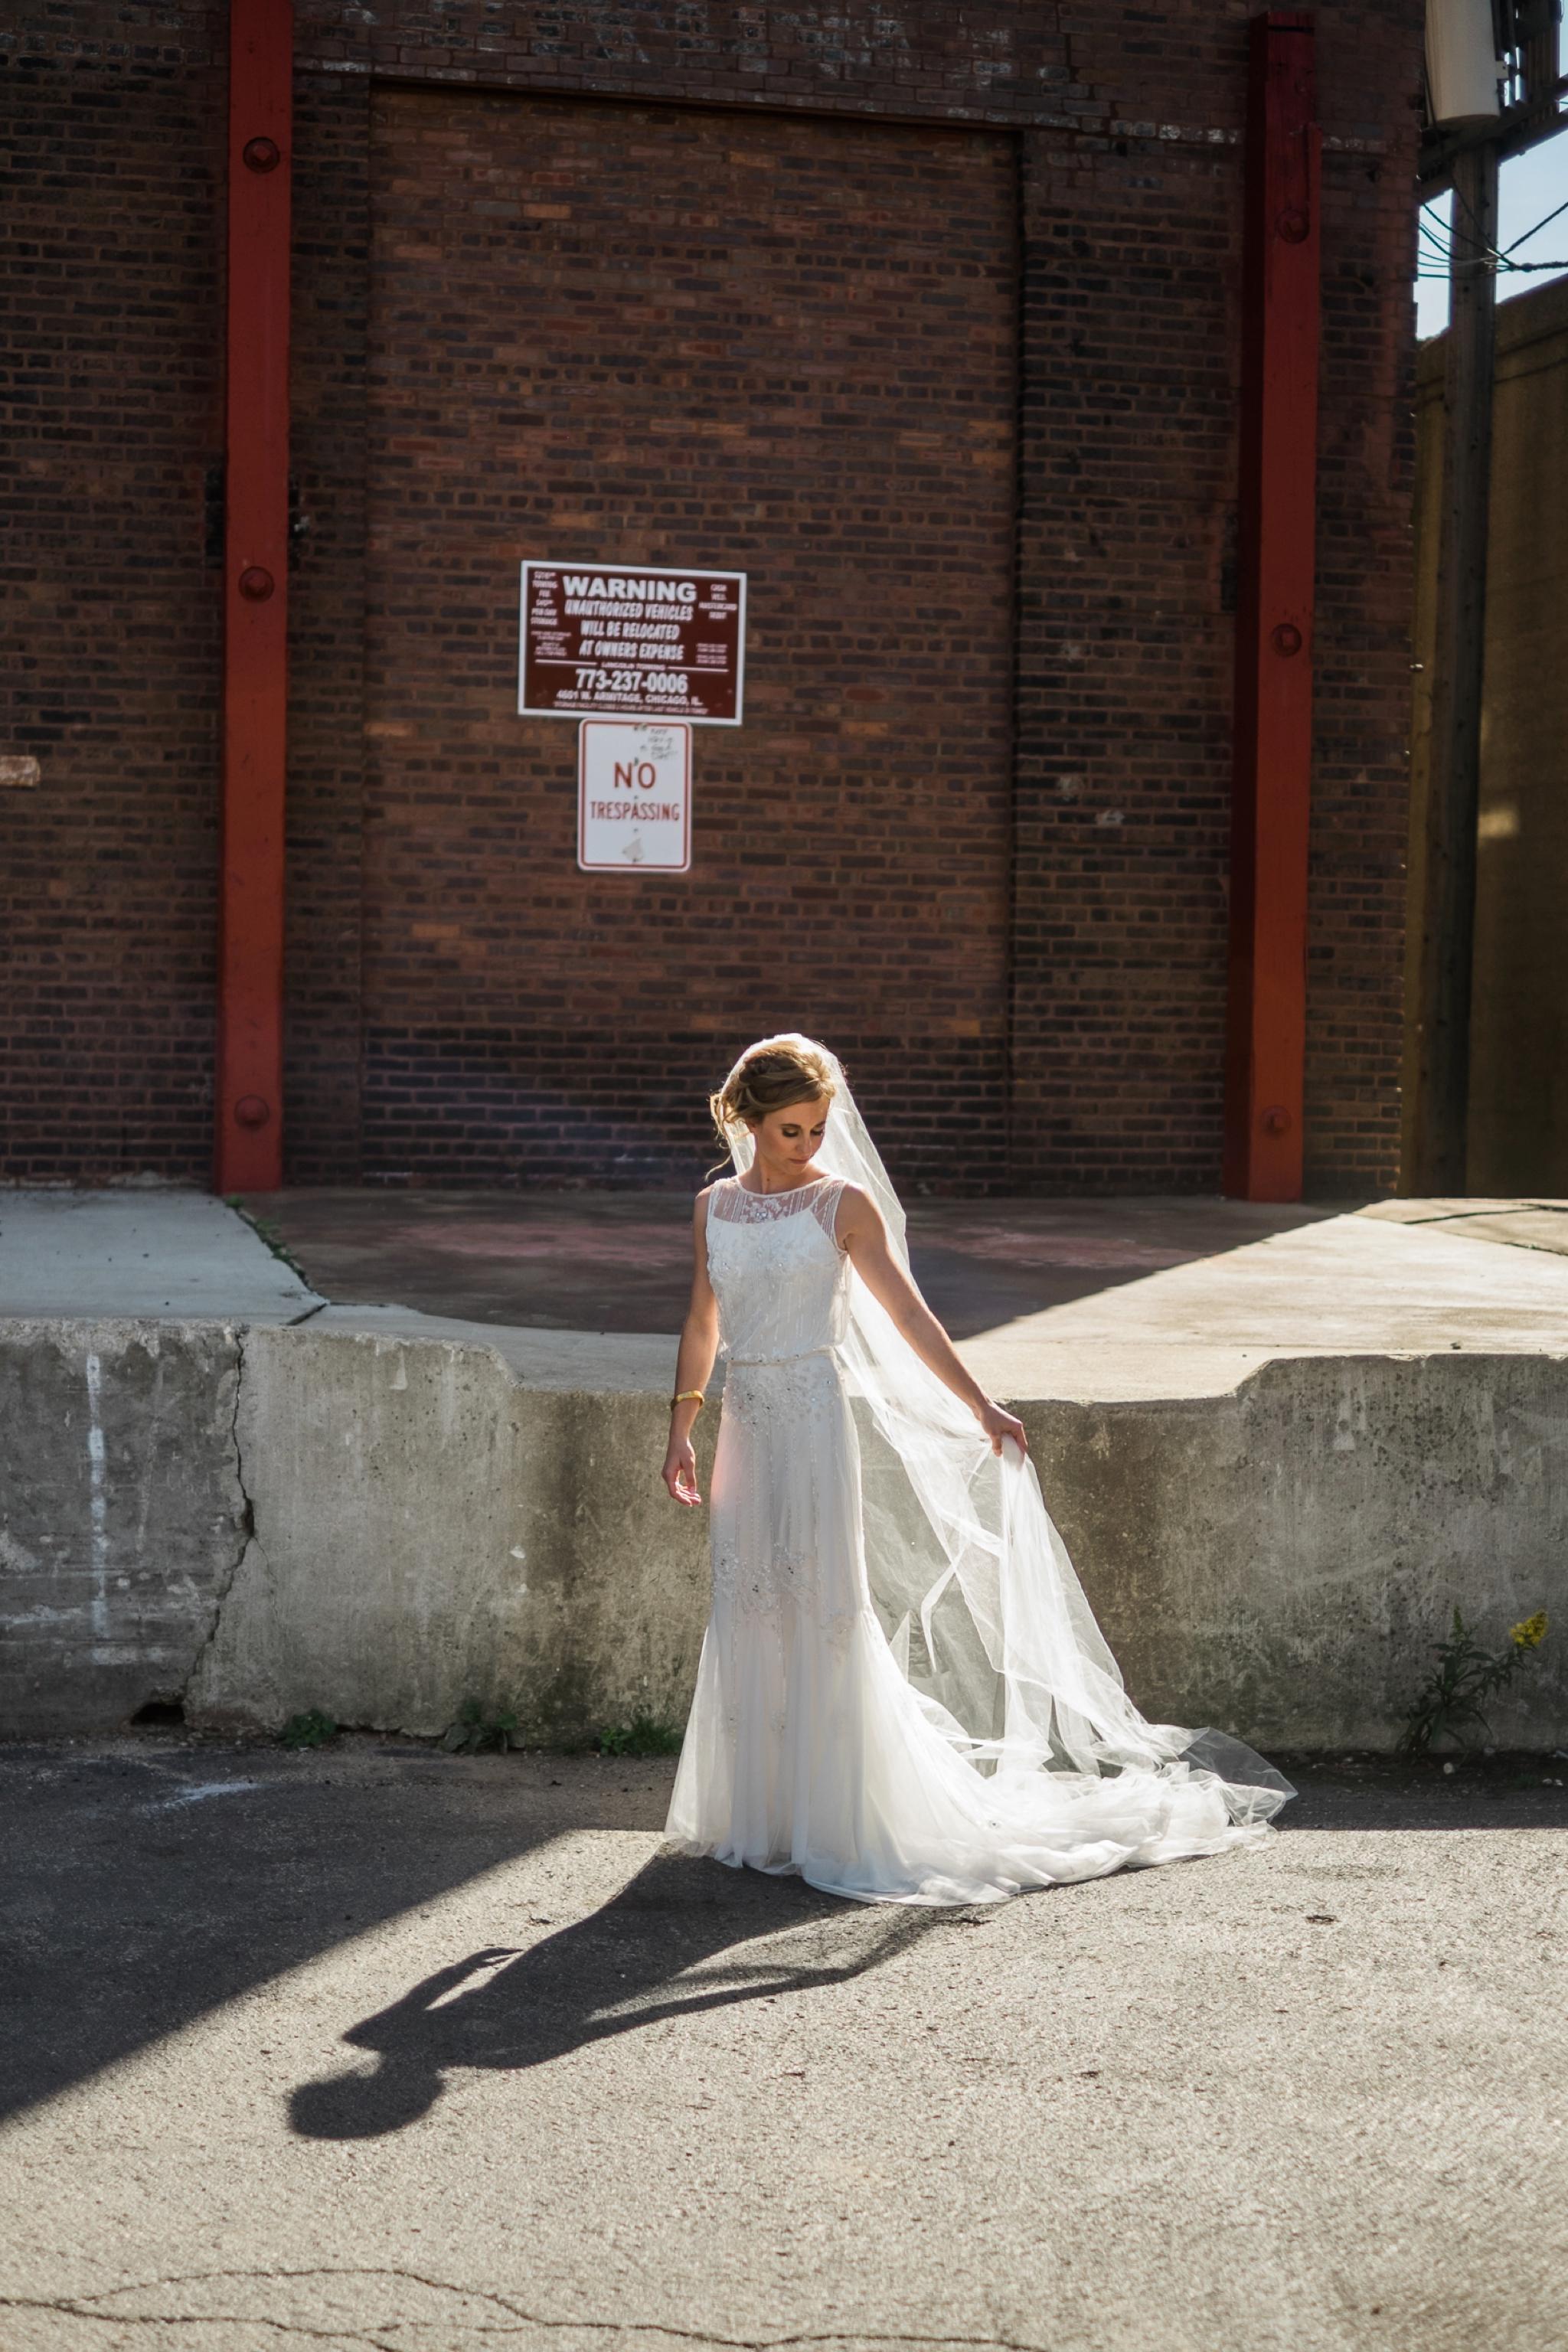 West-Supply-Foundry-Chicago-Wedding-073.jpg